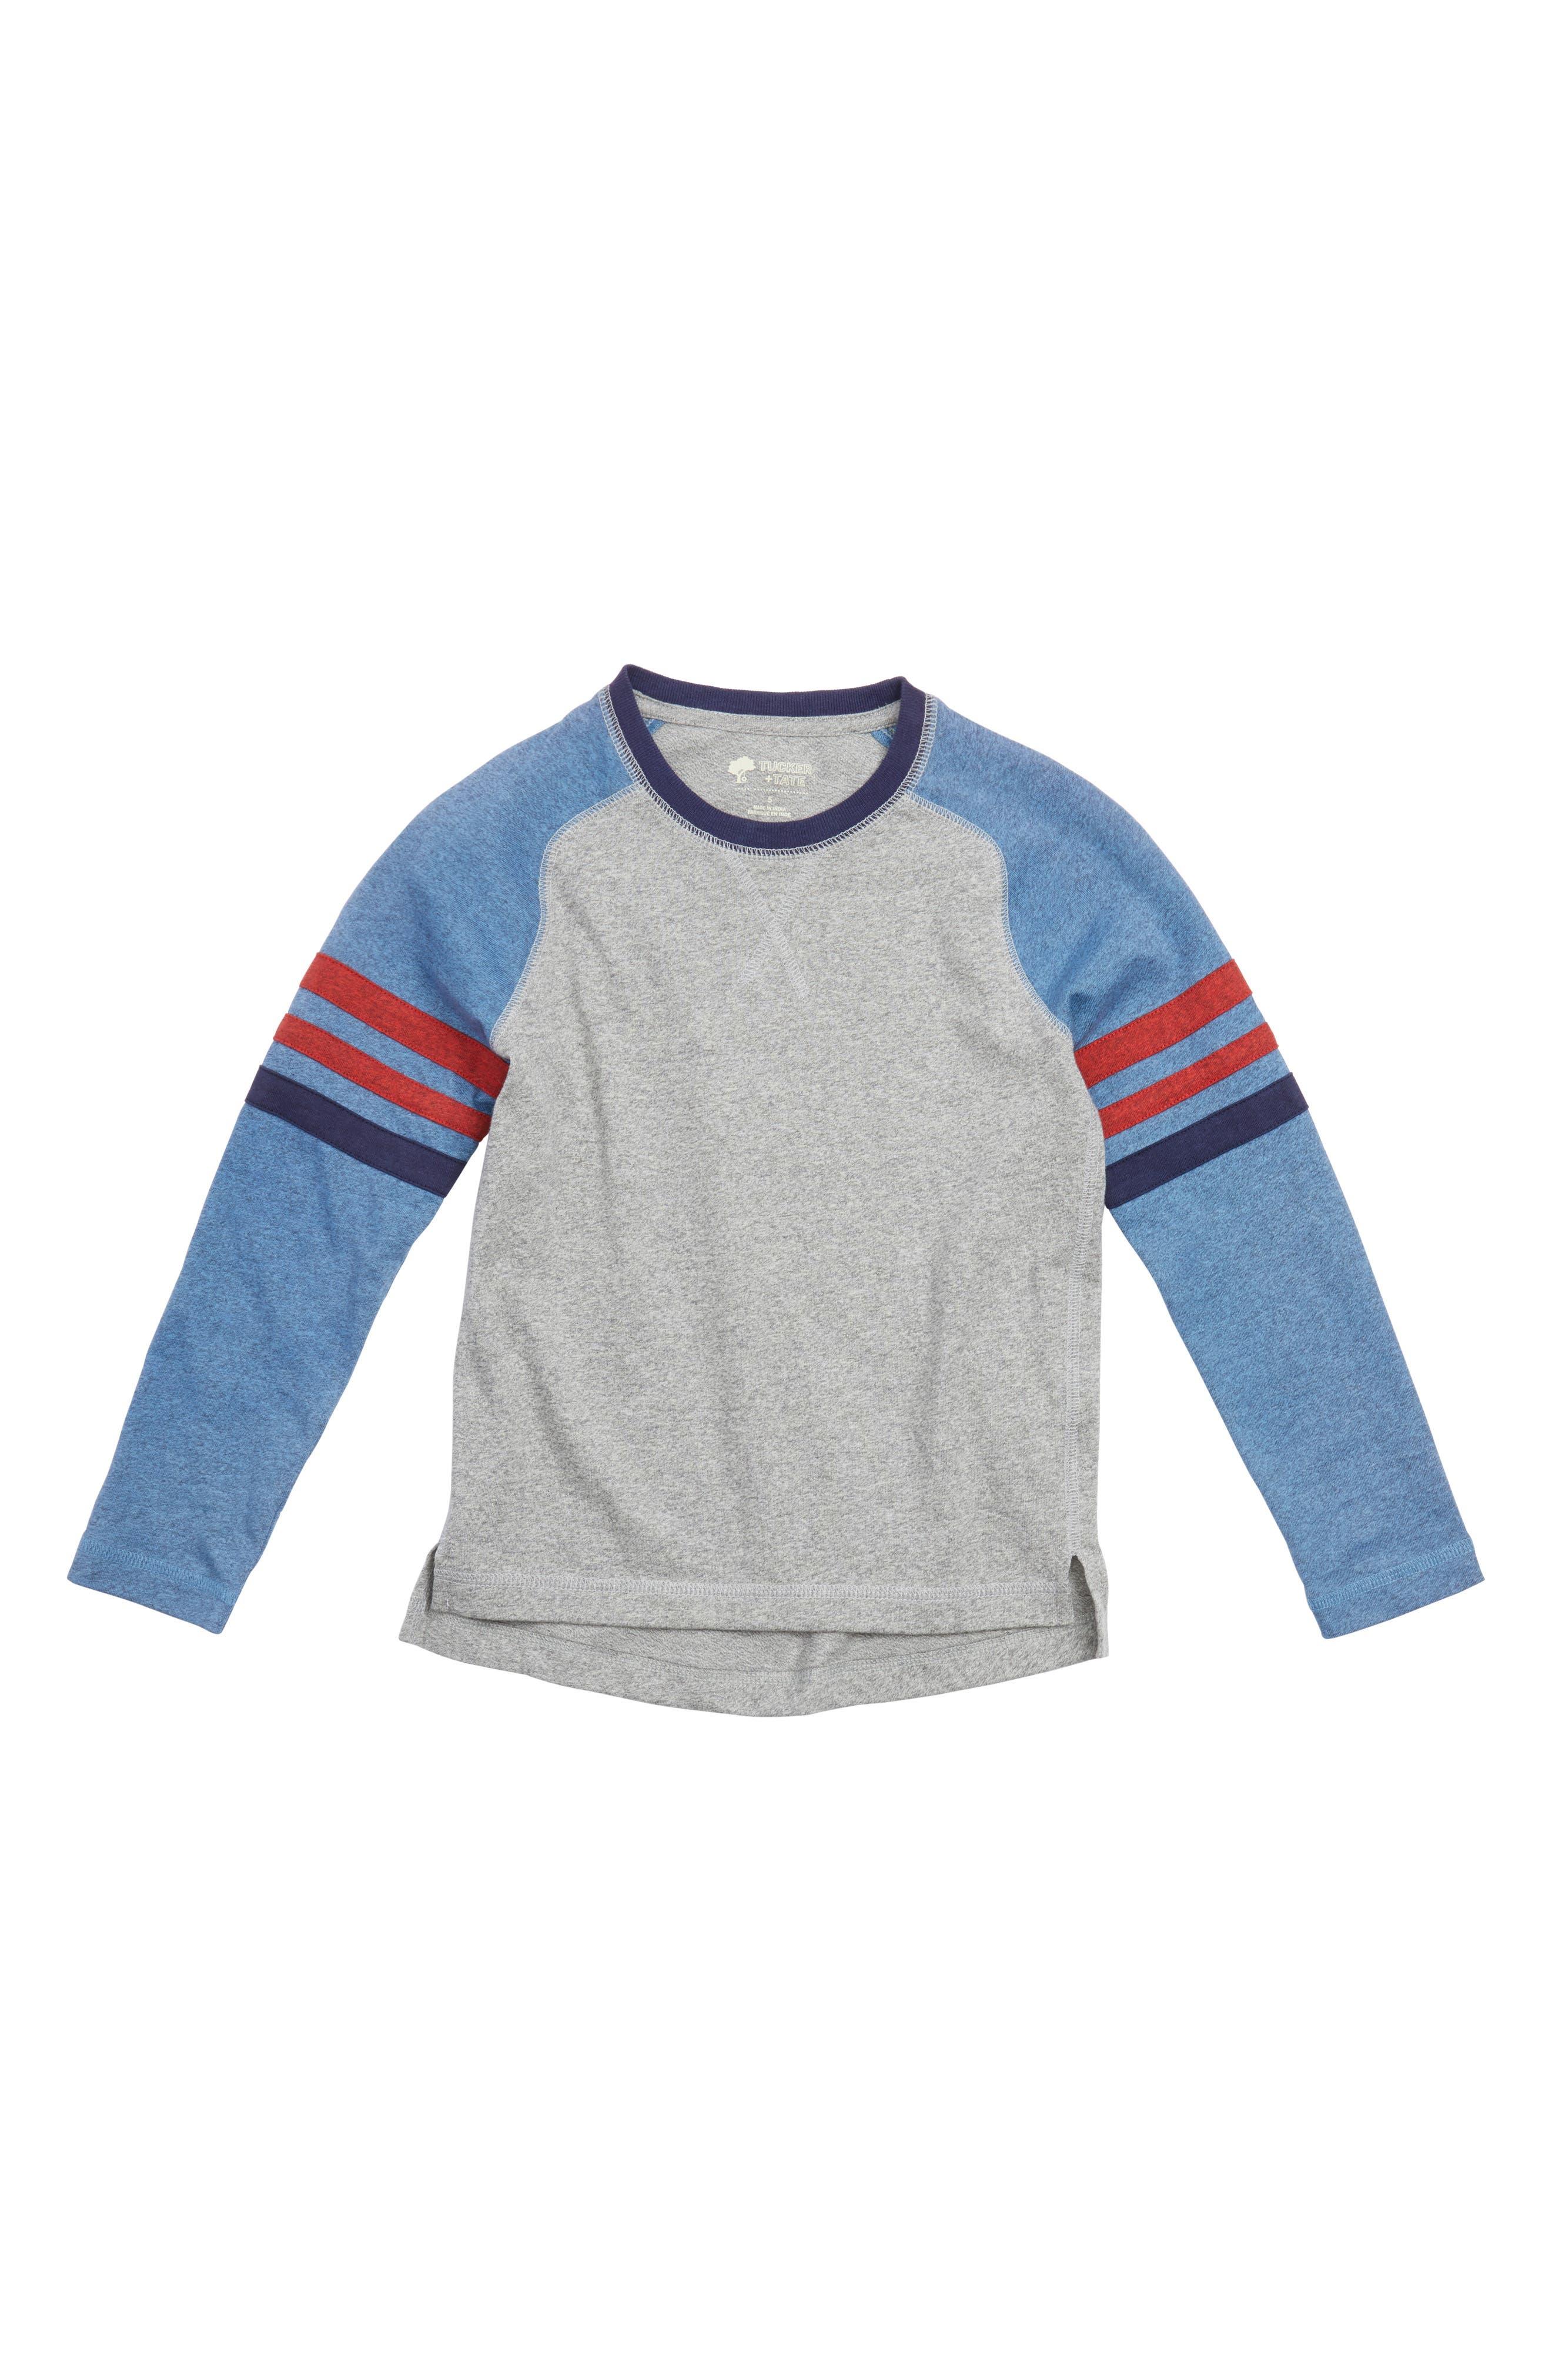 Main Image - Tucker + Tate Varsity Raglan T-Shirt (Toddler Boys & Little Boys)